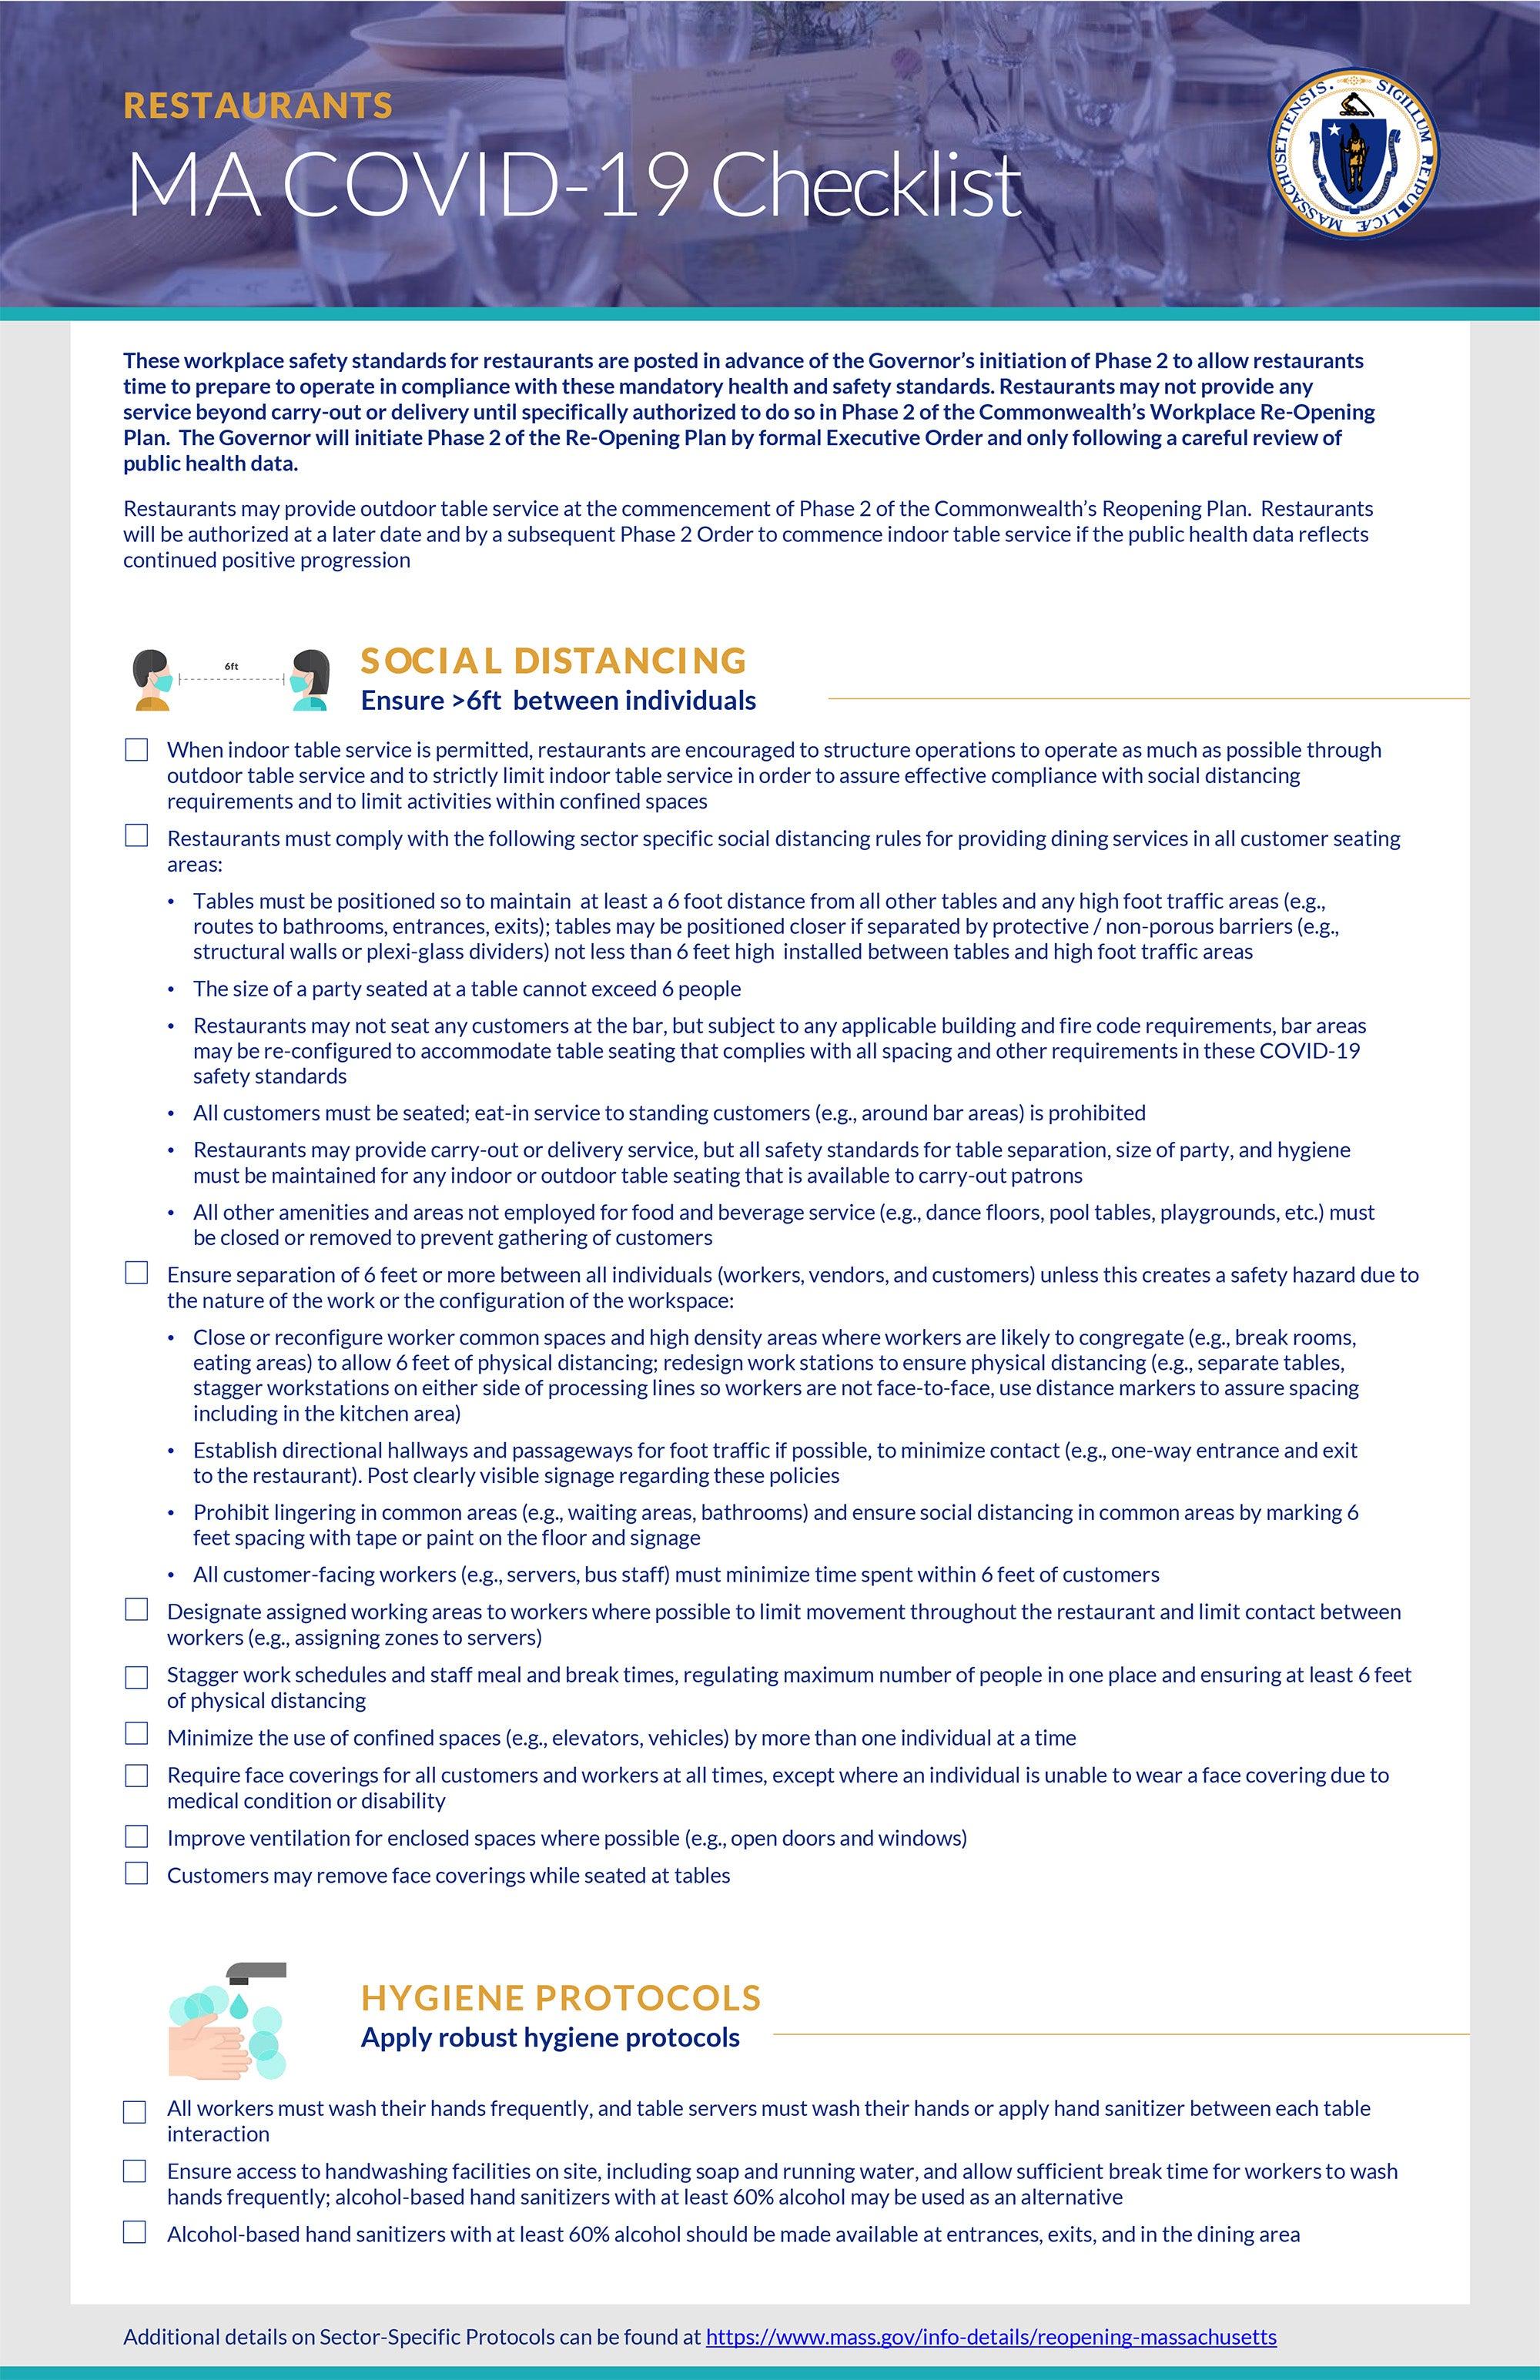 MA COVID-19 checklist for restaurants